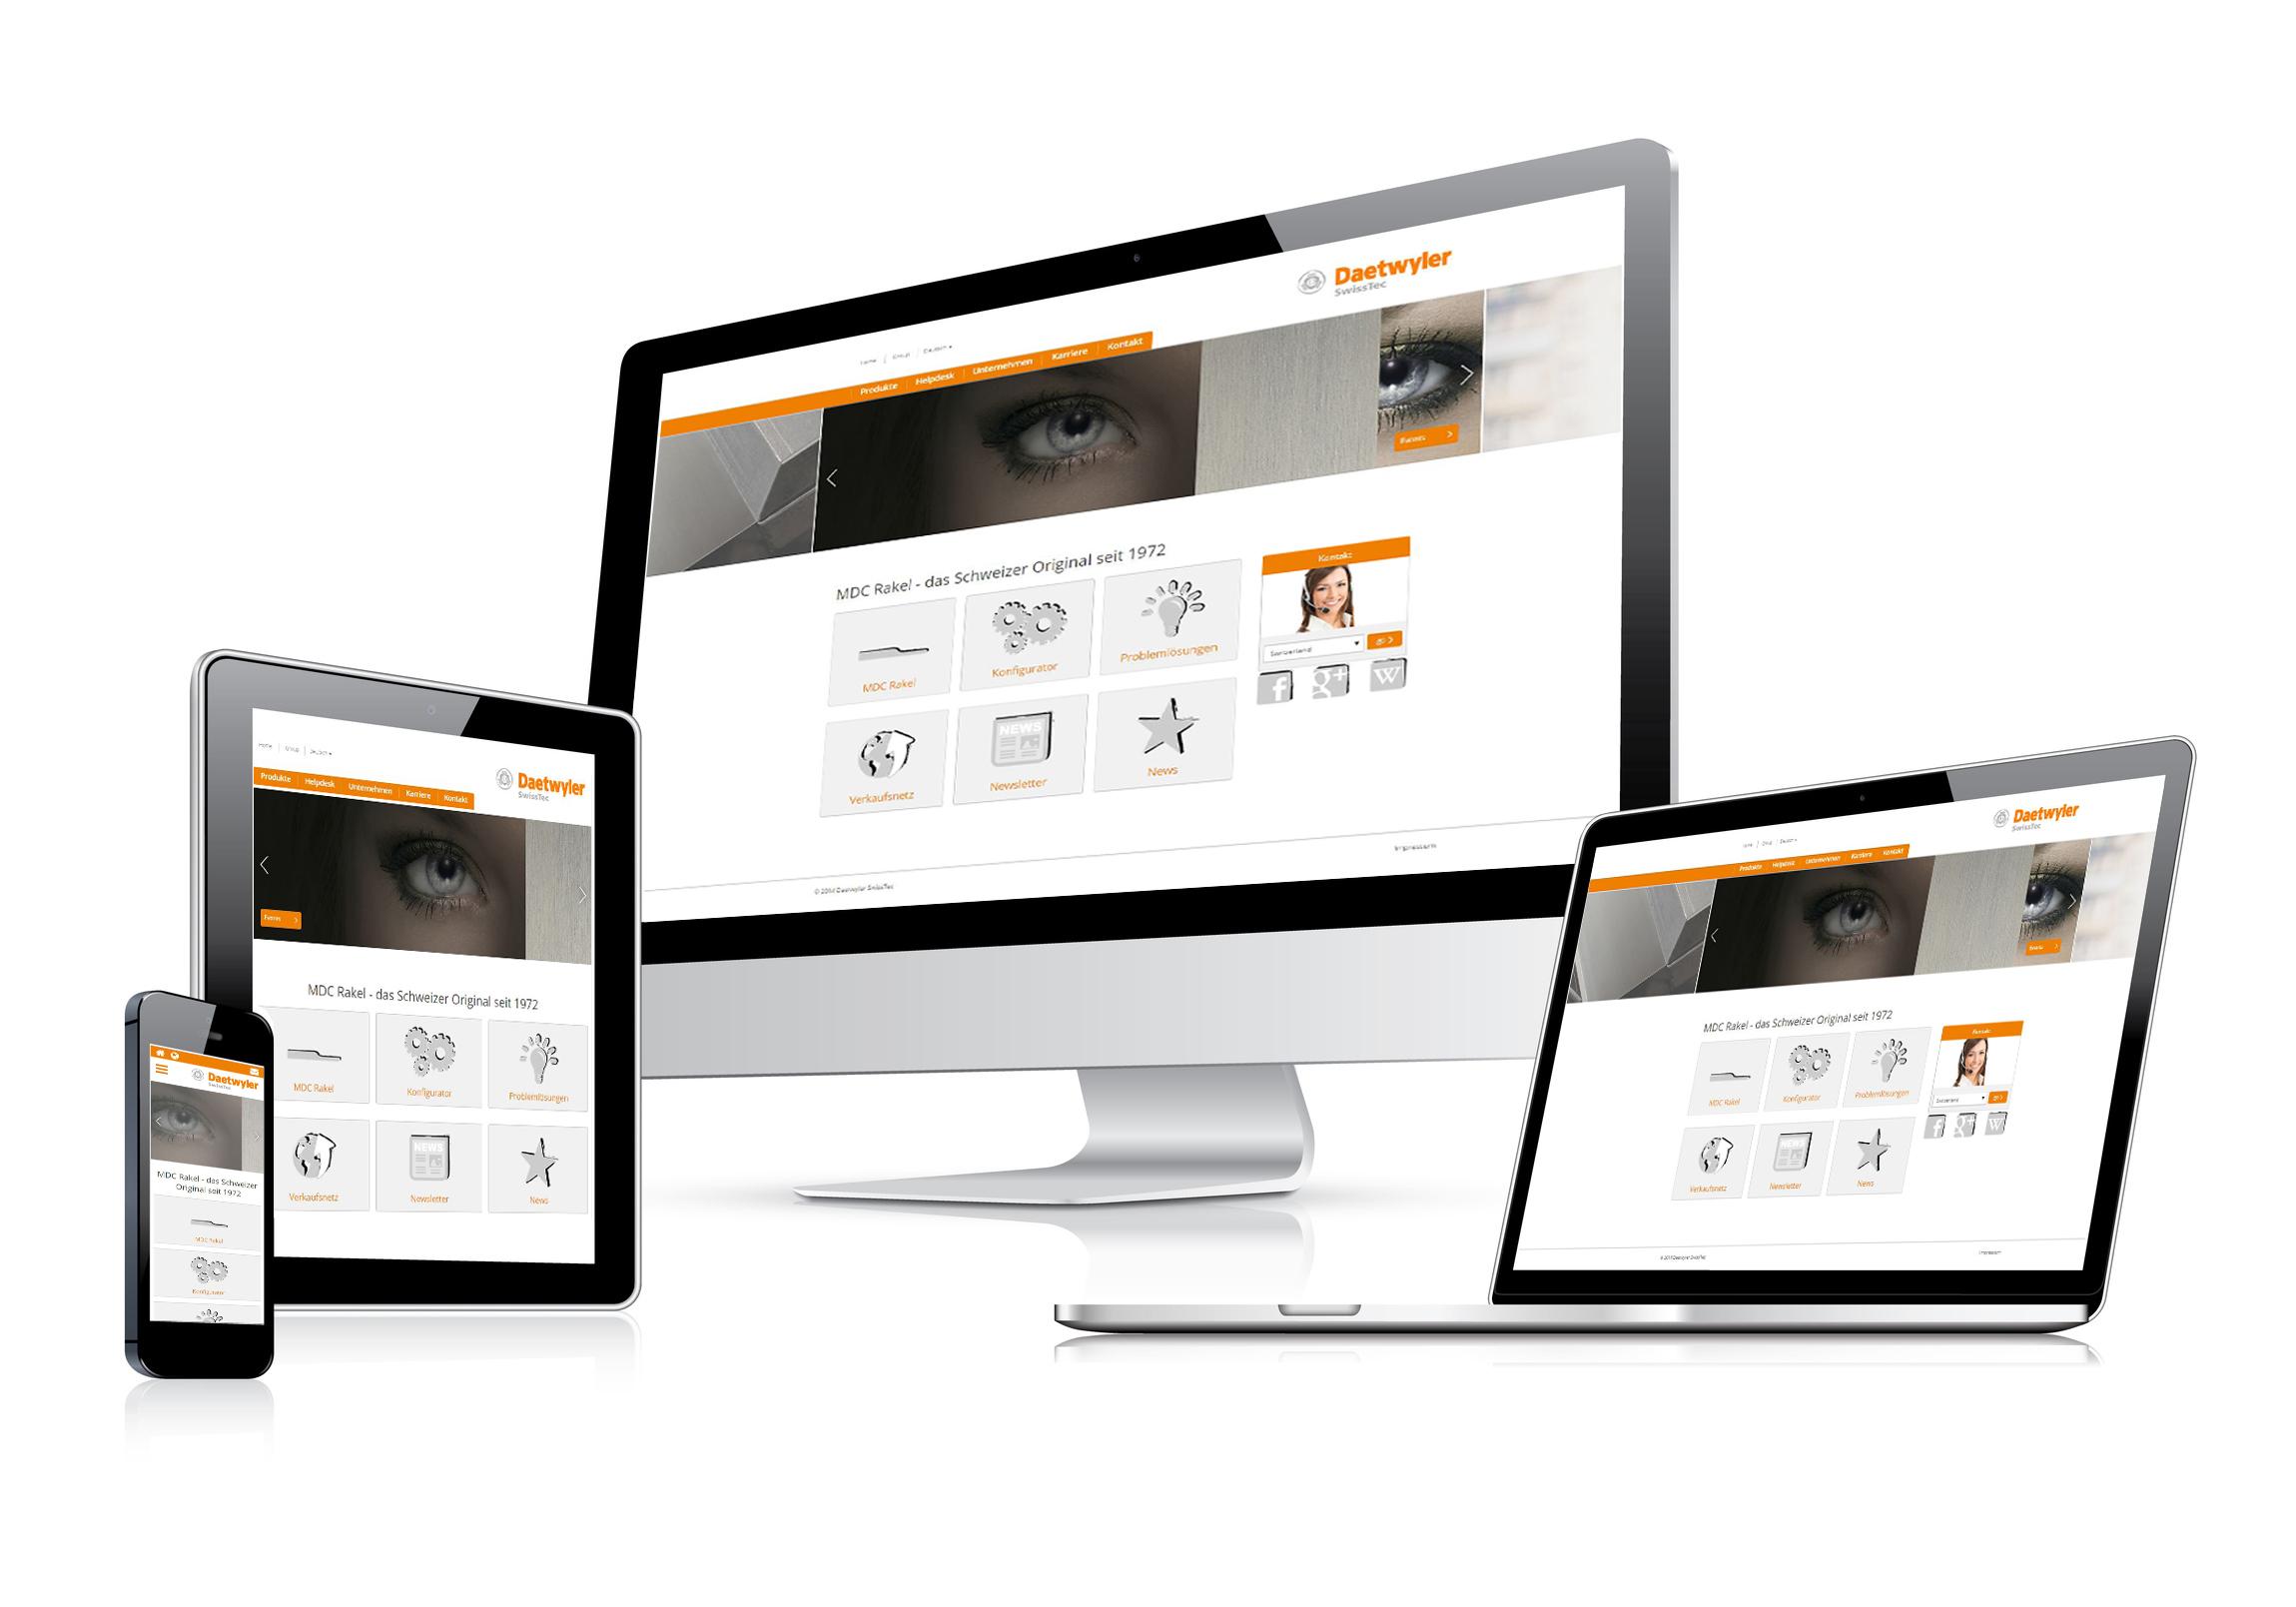 Daetwyler SwissTec Webseite im responsive Design